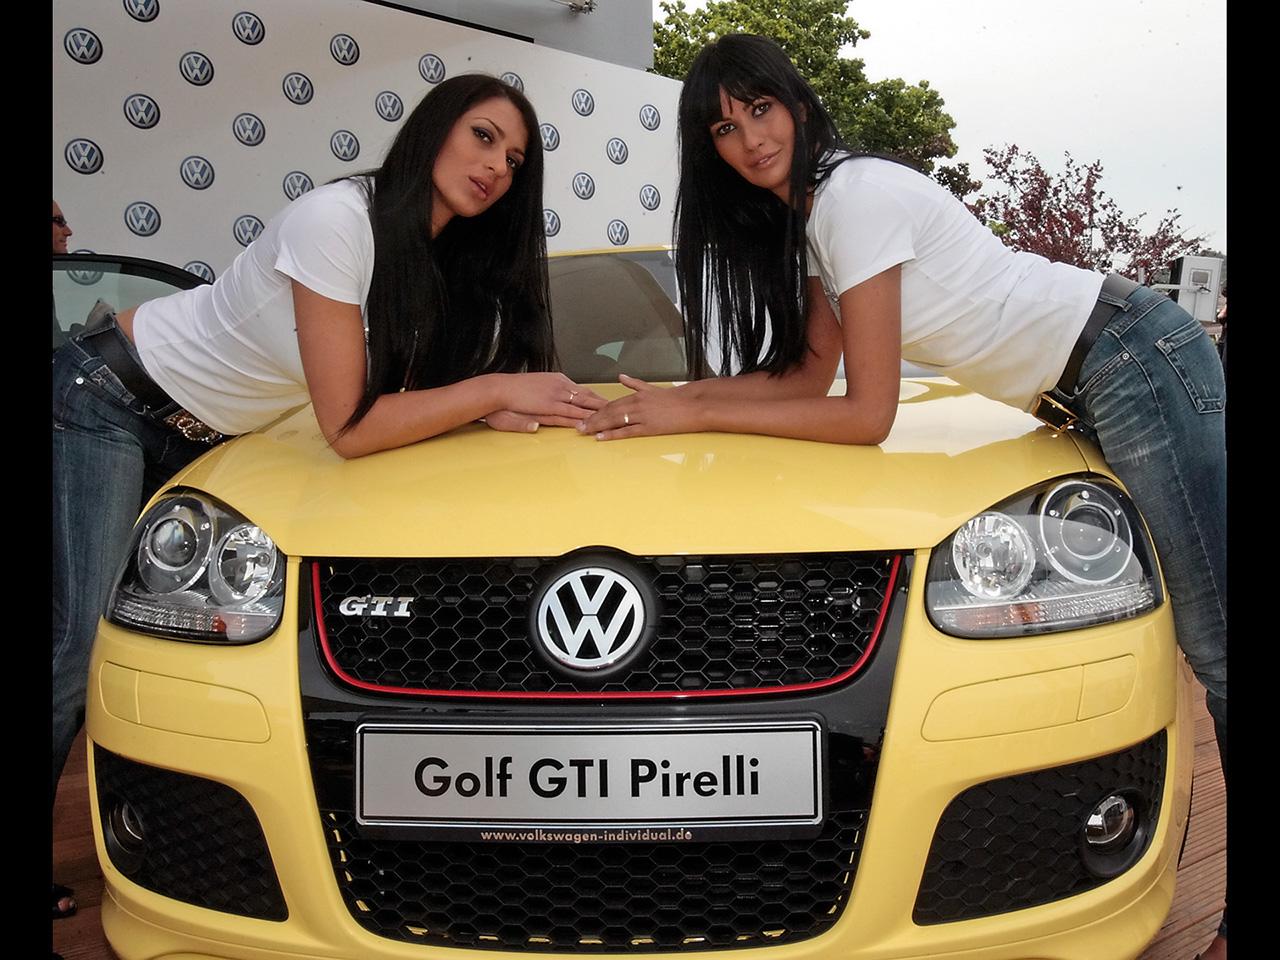 http://3.bp.blogspot.com/_cLWqMZQ1CPk/TH1OB7YIIKI/AAAAAAAACf0/bdYncx2WBQI/s1600/2008-Volkswagen-Golf-GTI-Pirelli-Girls-1280x960.jpg